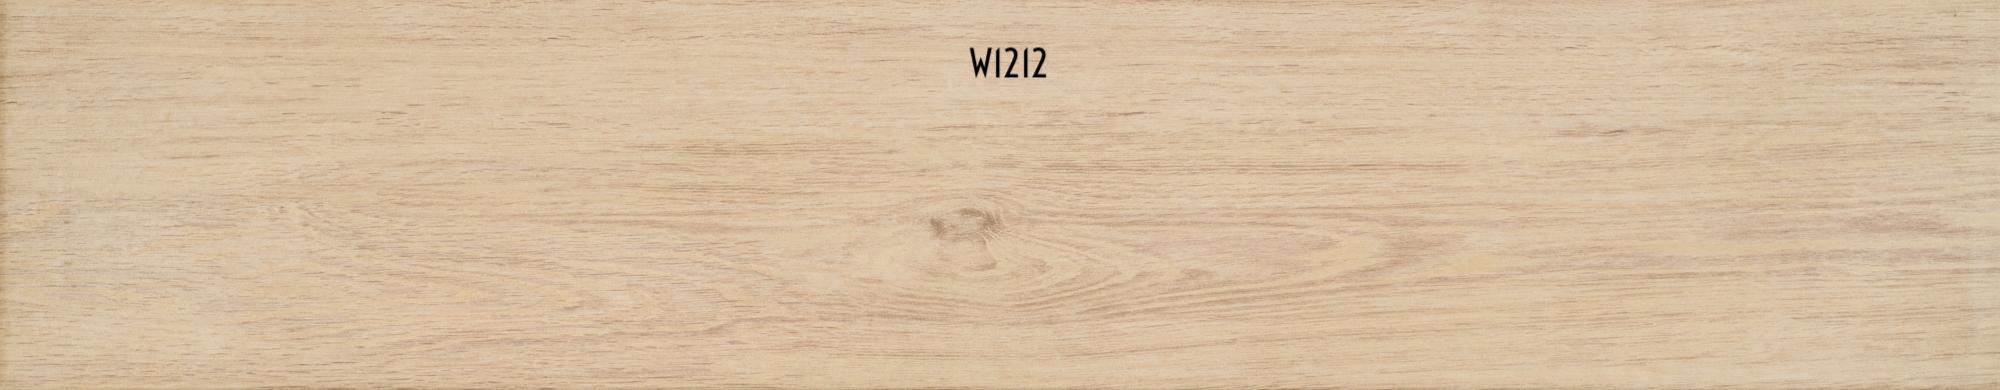 W1212